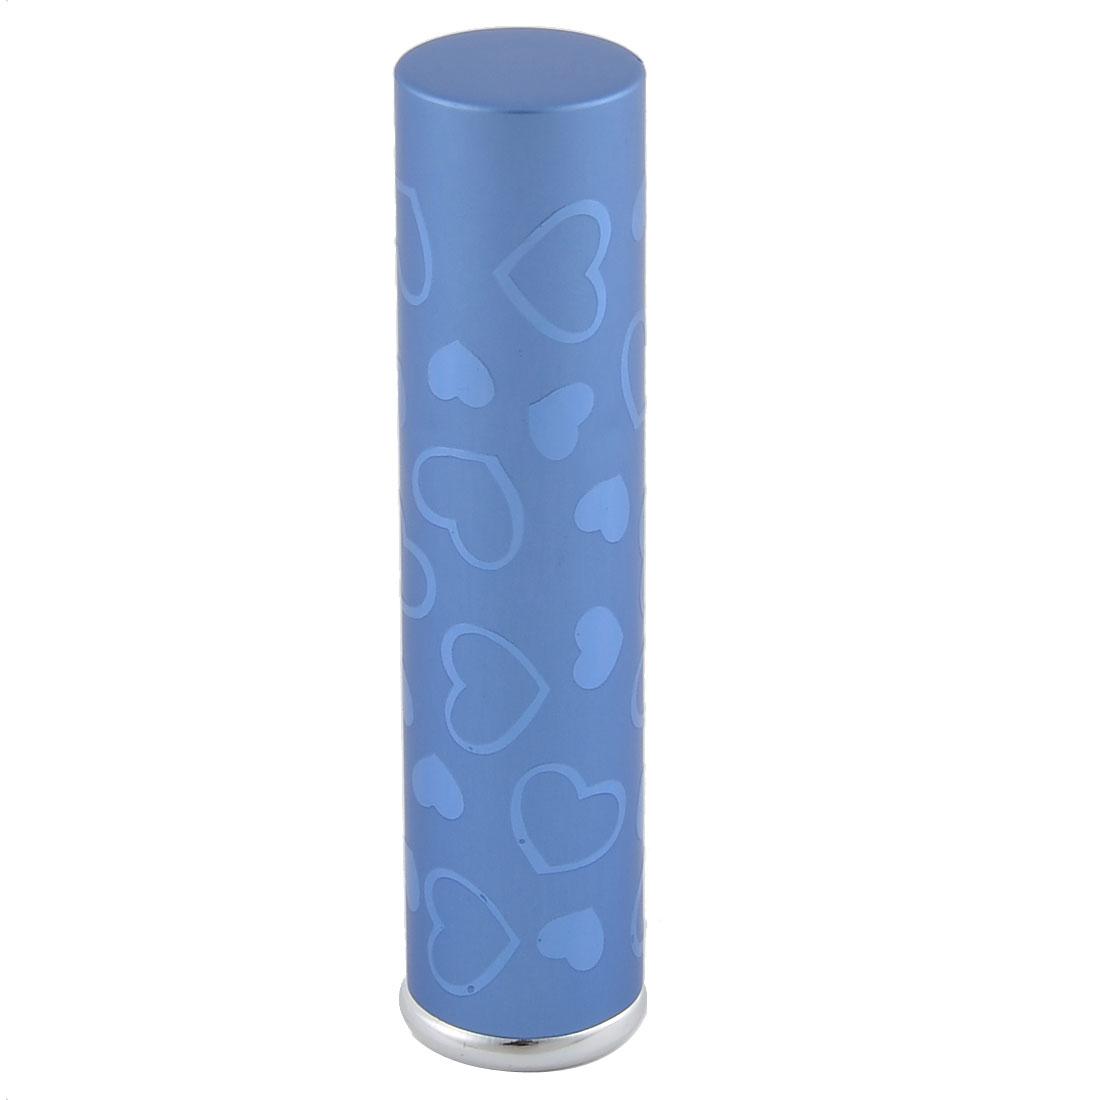 7mL Travel Portable Heart Pattern Mini Refillable Perfume Spray Bottle Blue